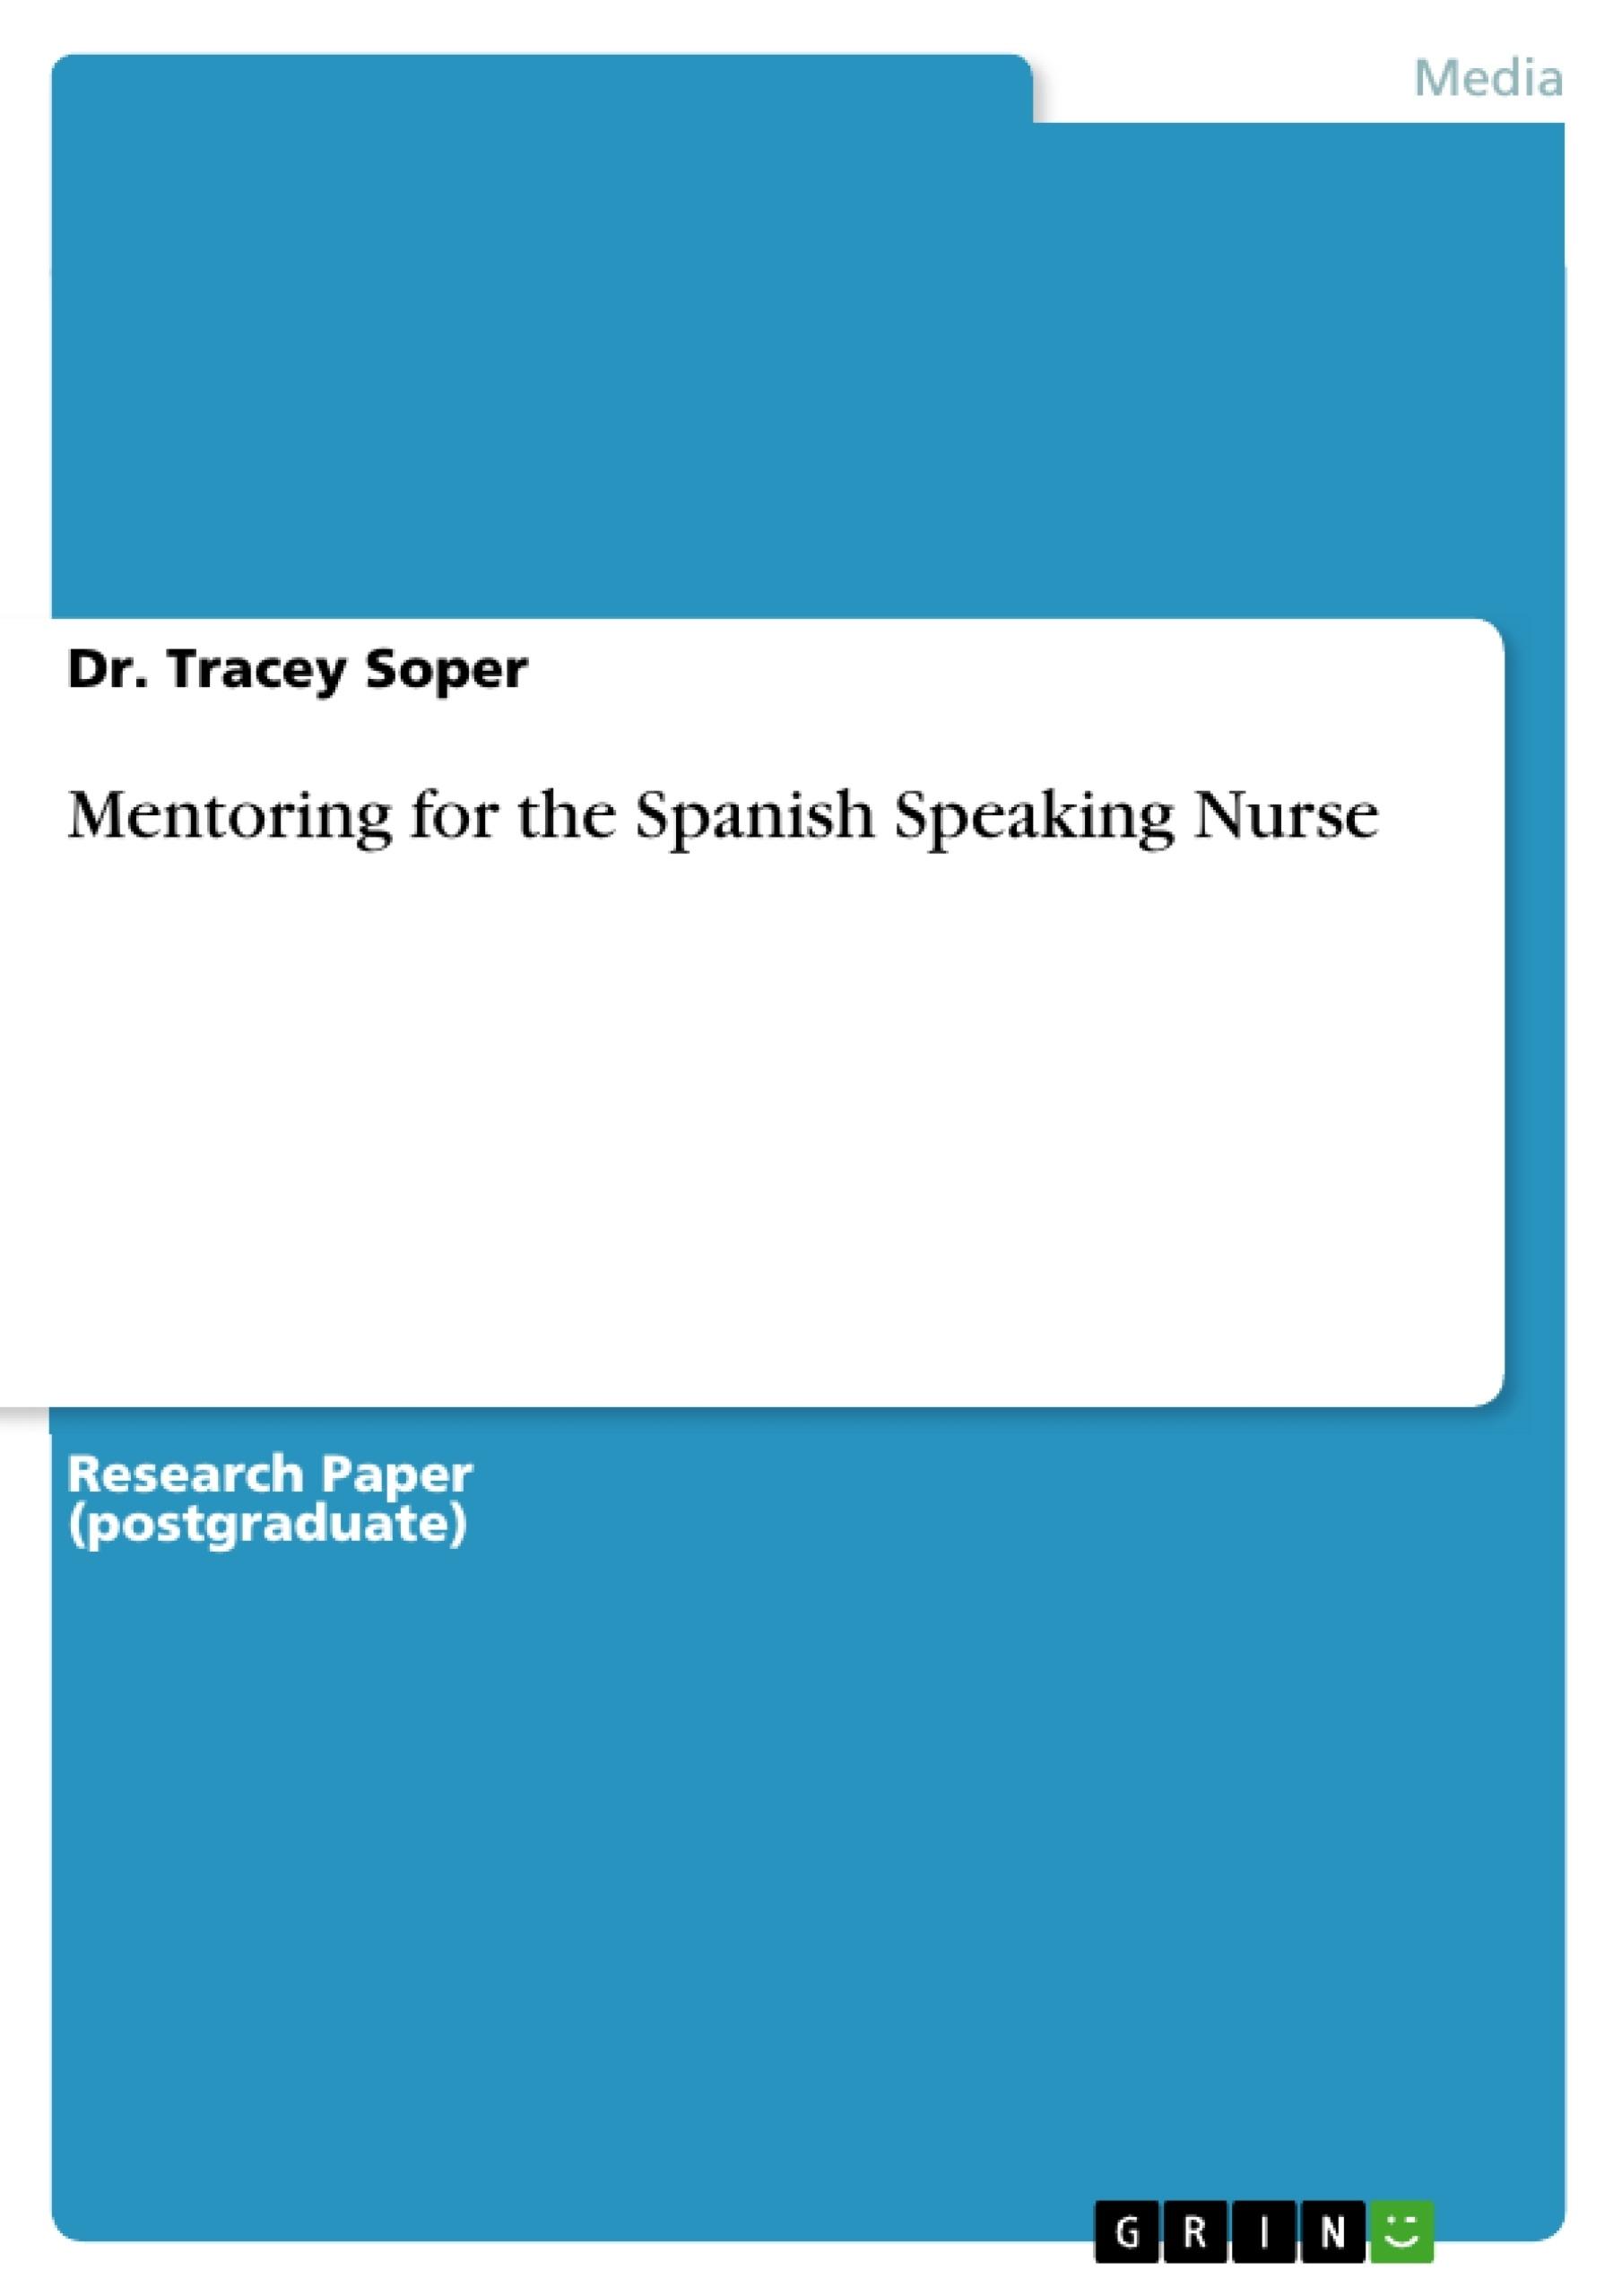 Title: Mentoring for the Spanish Speaking Nurse